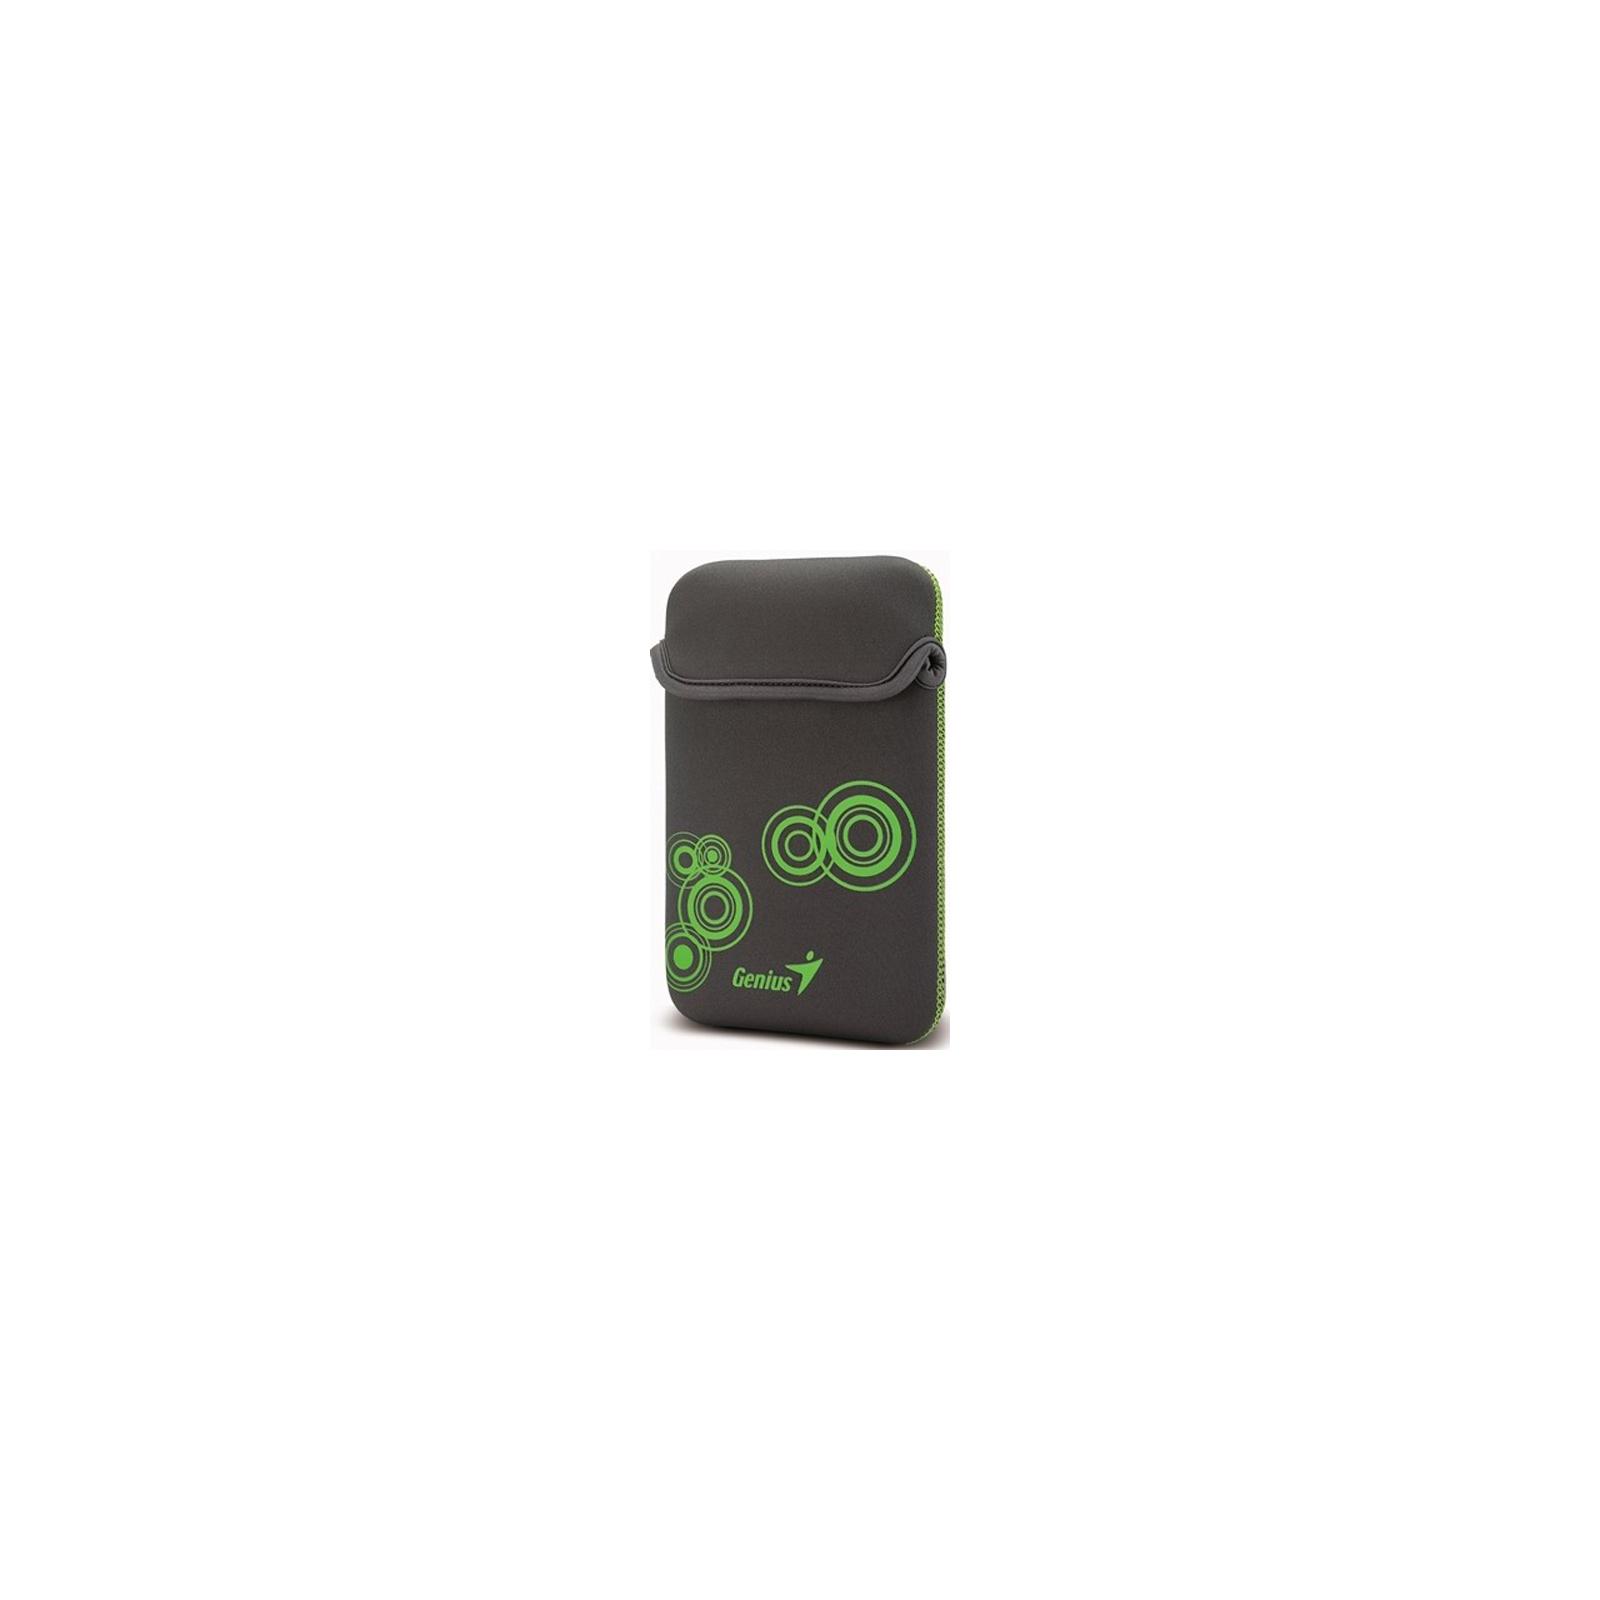 "Чехол для планшета Genius 7"" GS-701 Gray+Green (39700009102)"